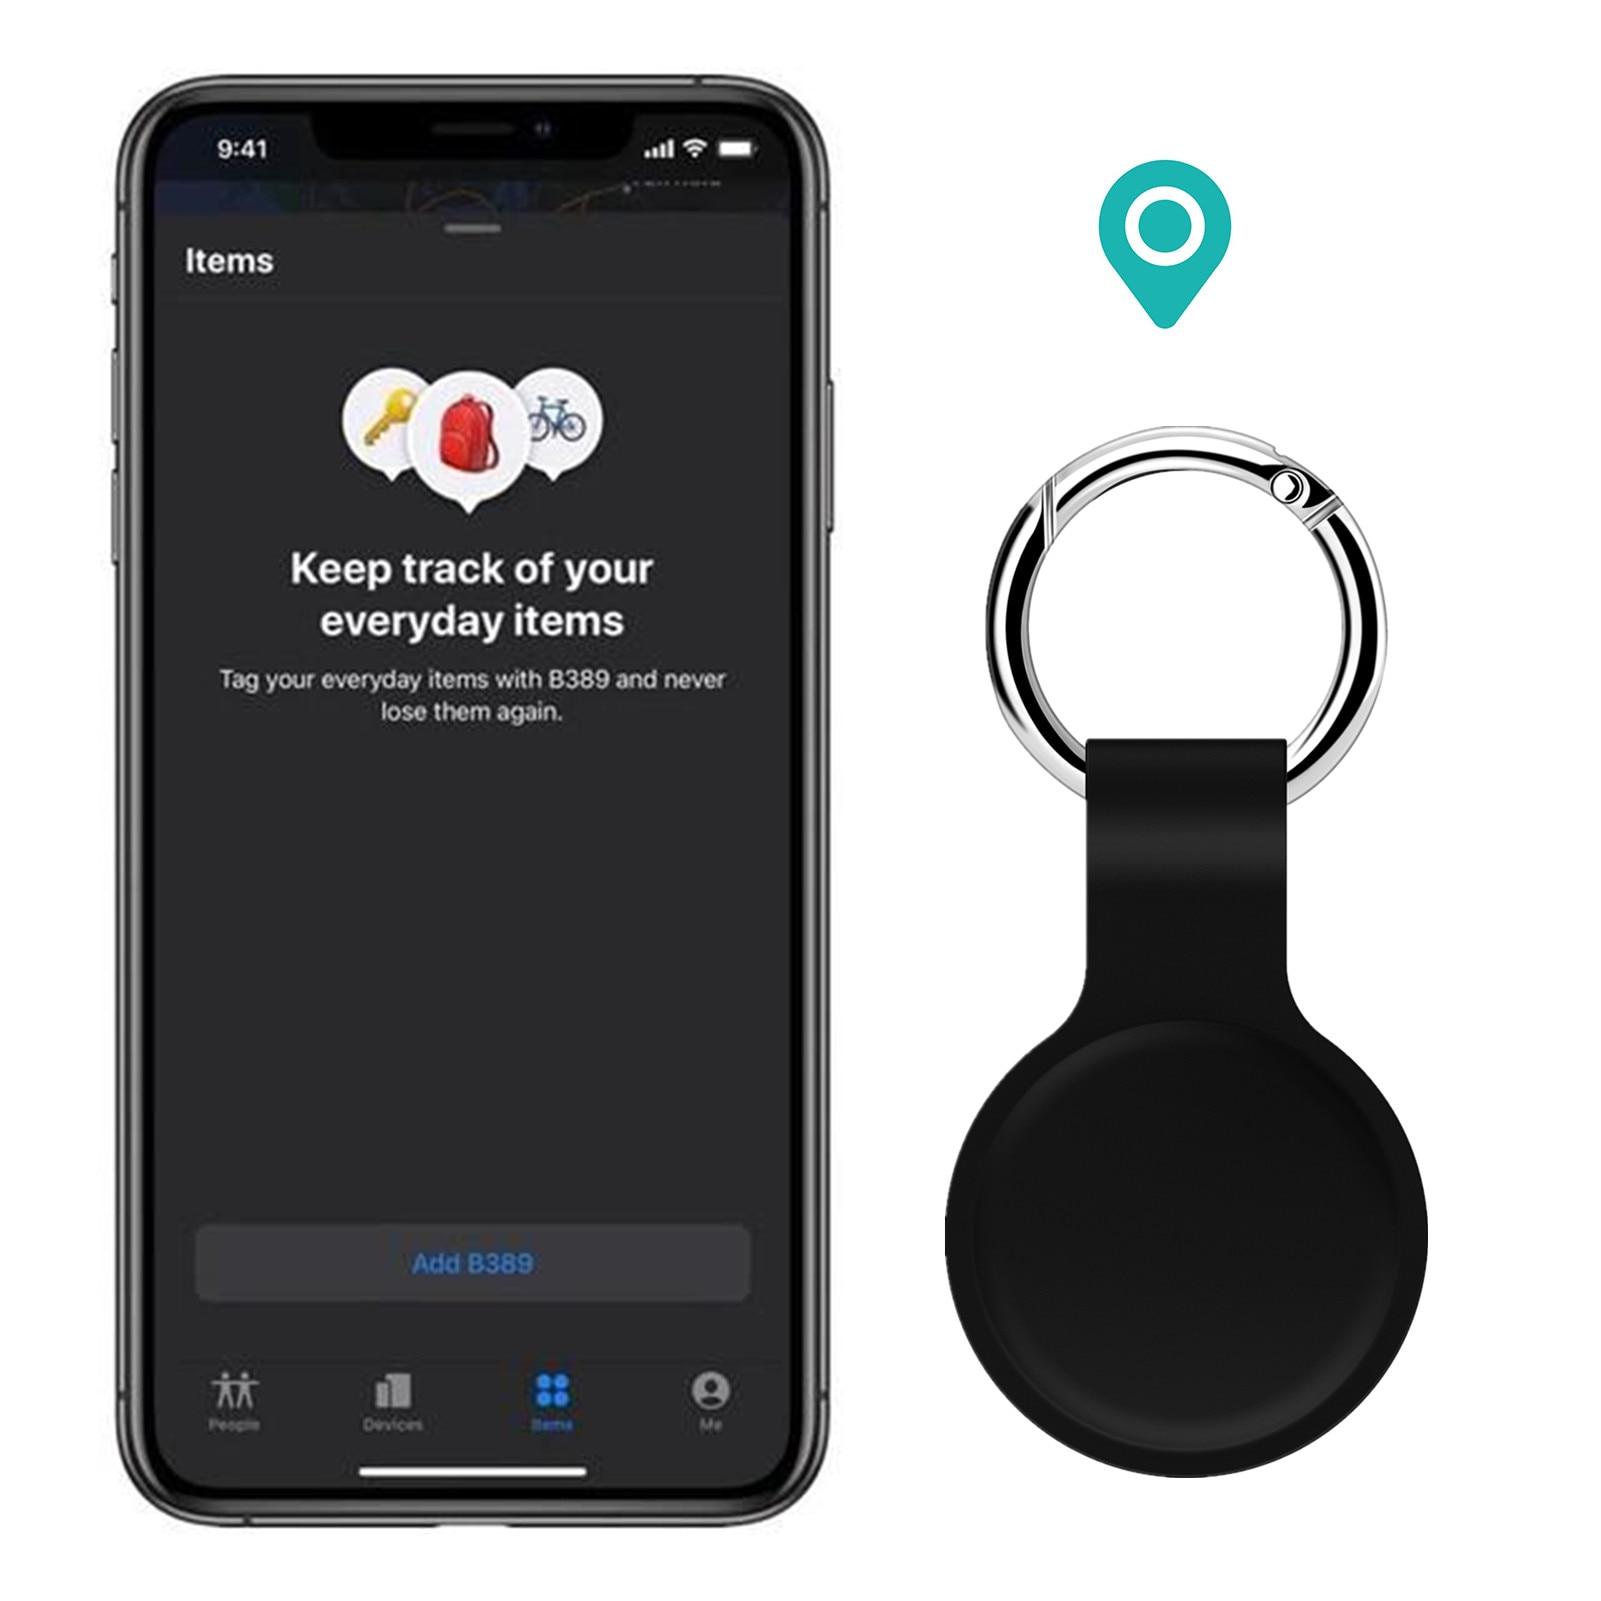 Для Apple локатор gps трекер анти-потерянный устройство брелок защитный рукав для Apple Airtags жидкий силиконовый защитный рукав